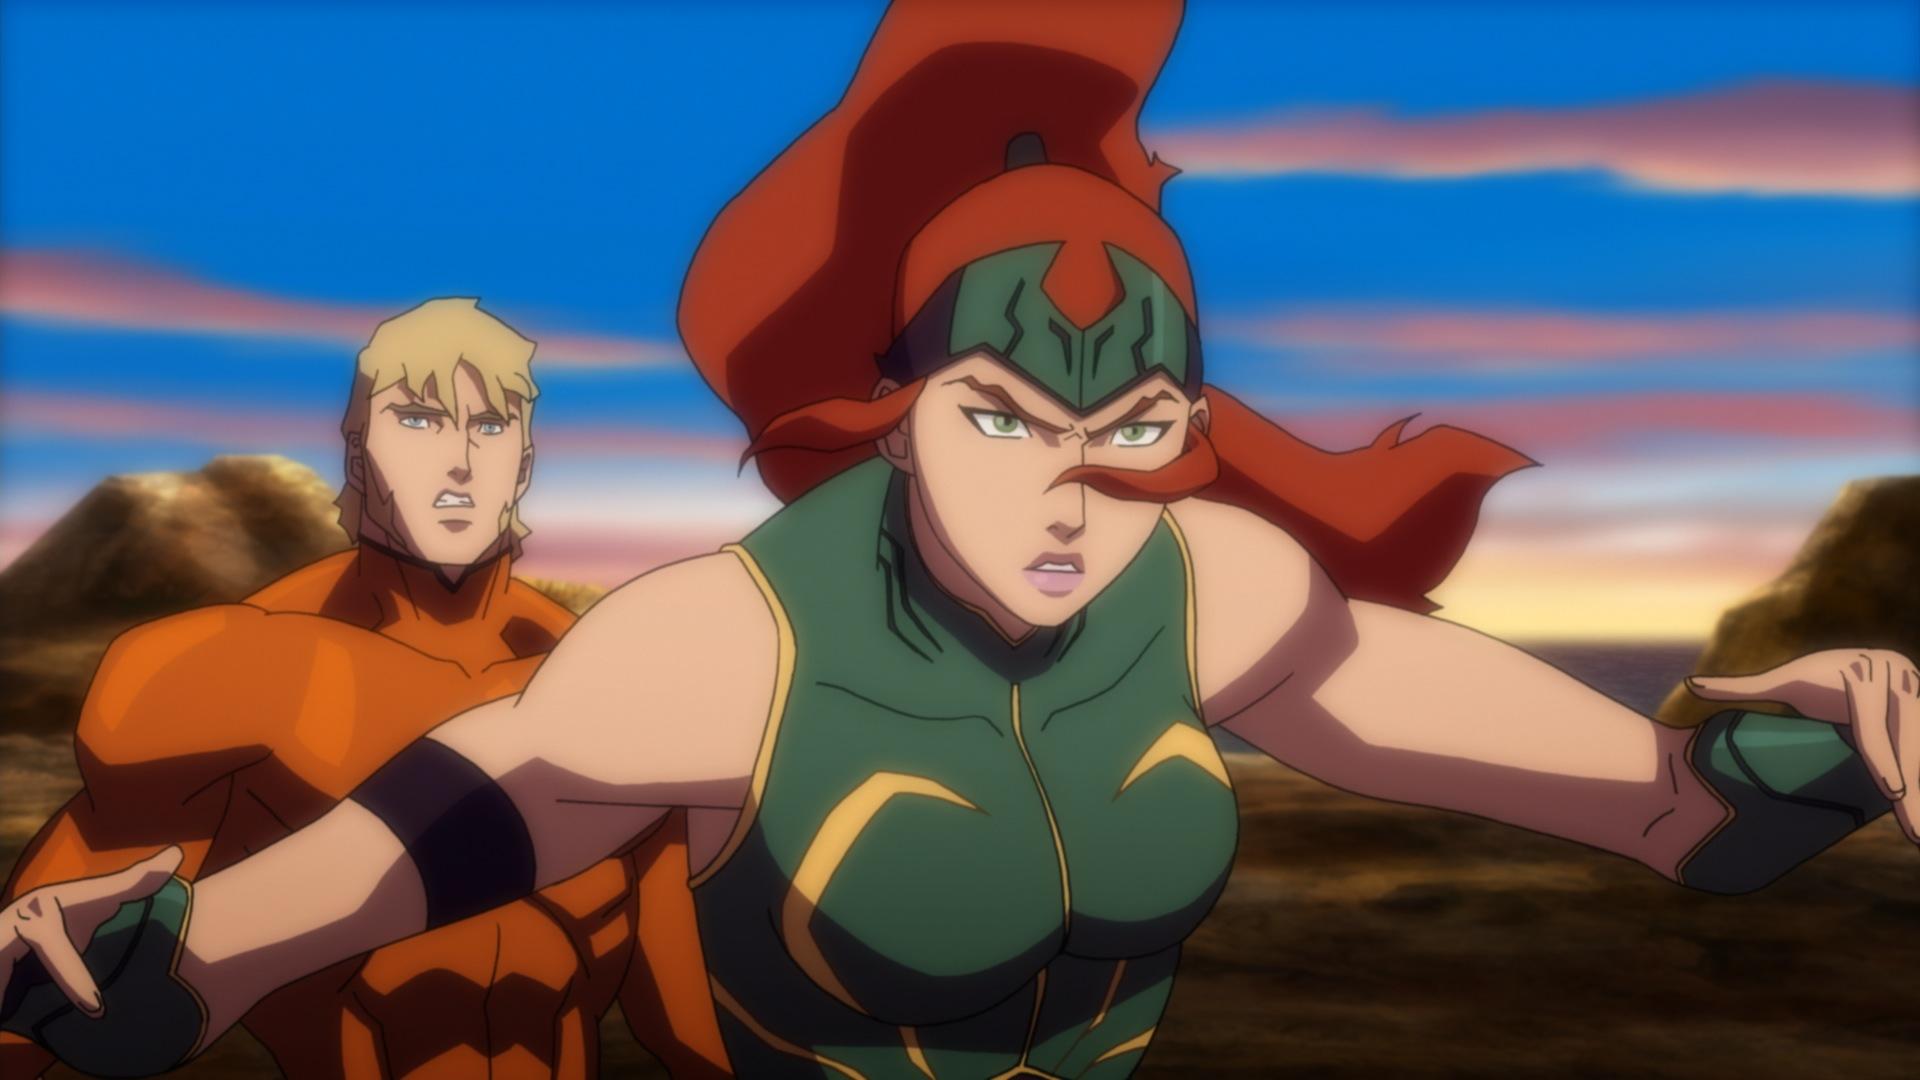 Arthur Curry Dc Animated Film Universe Dc Movies Wiki Fandom Powered By Wikia Animation Film Aquaman Anime Superhero